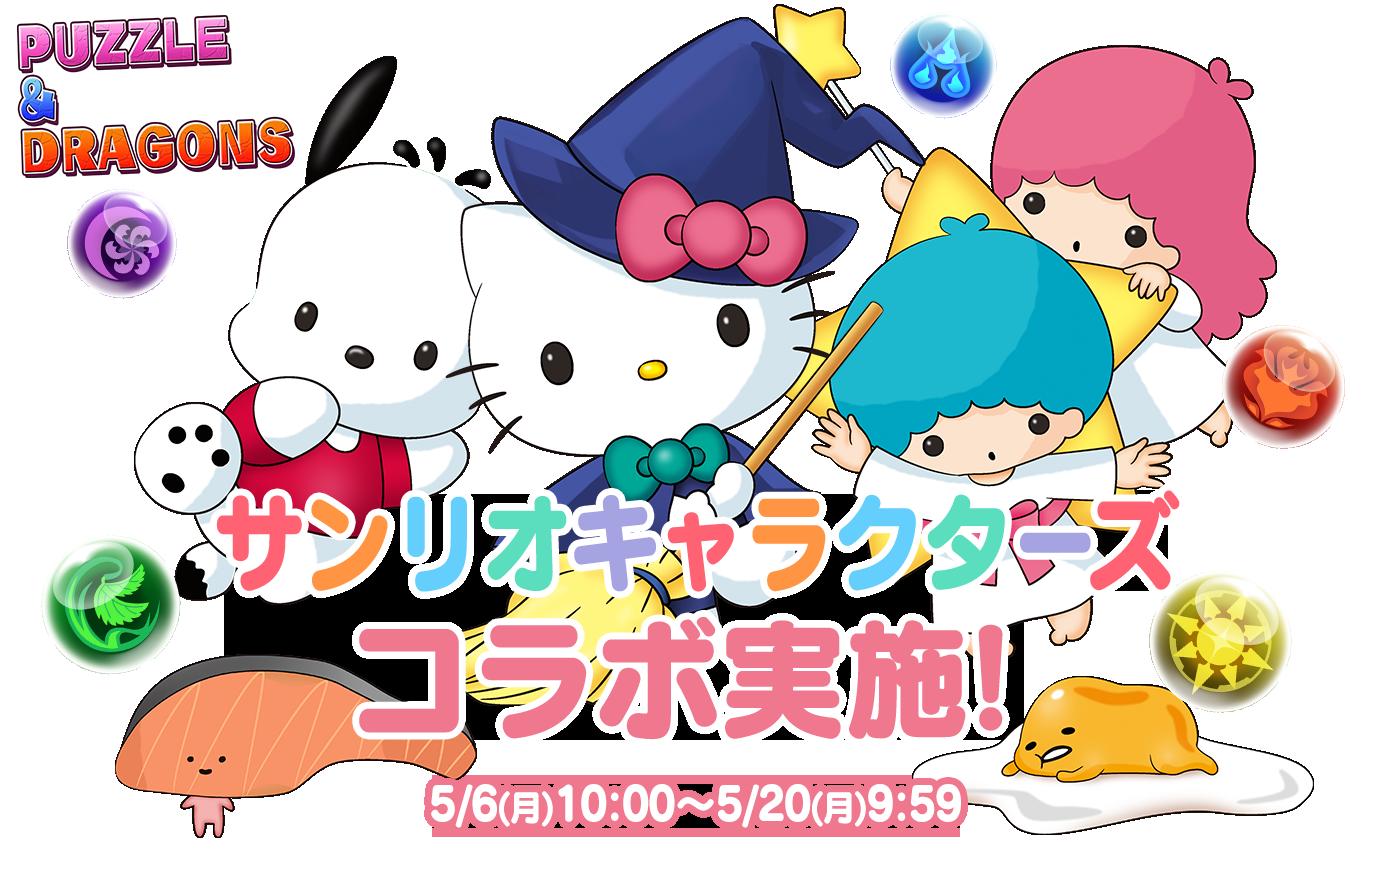 https://pad.gungho.jp/member/collabo/sanrio/190426/img/main_pc.png